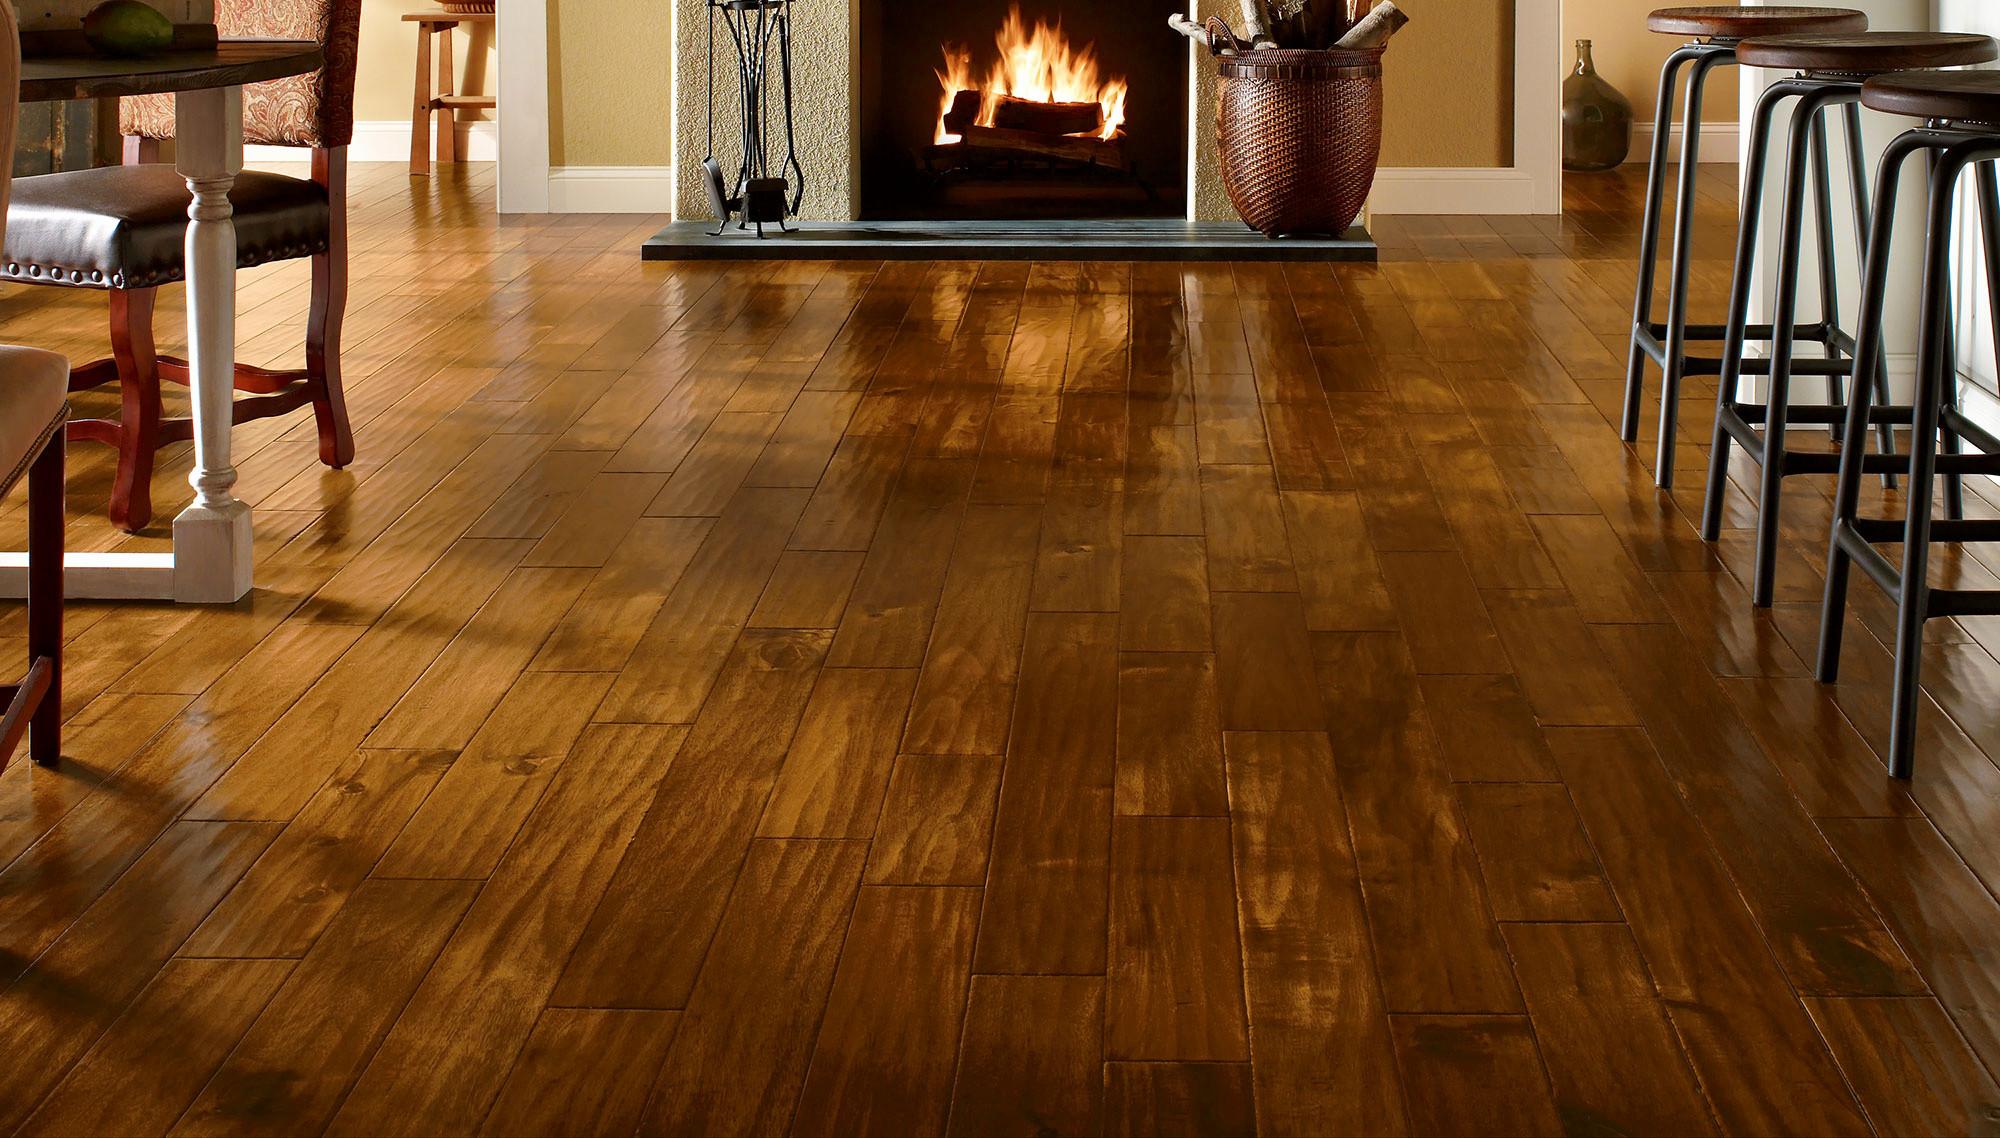 hardwood flooring wholesale atlanta of hardwood floor installation archives wlcu for hardwood floor designs best of appealing discount hardwood flooring 1 big kitchen floor hardwood floor